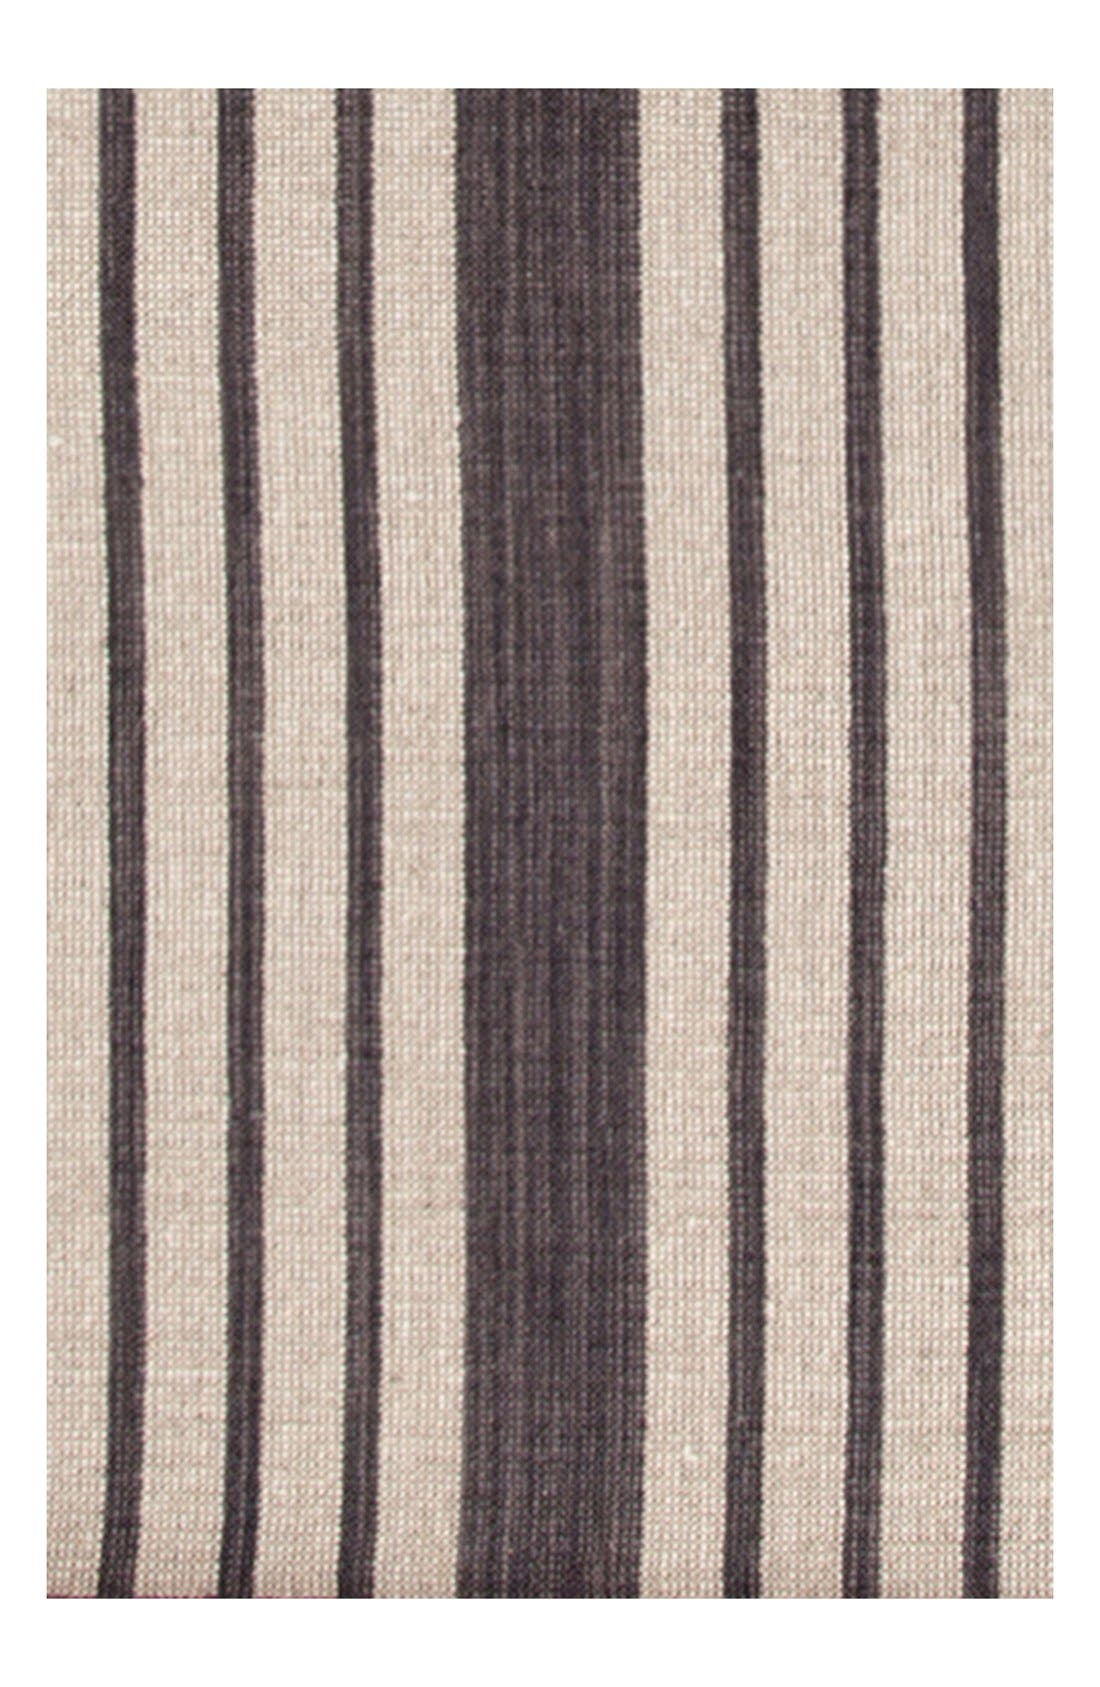 'Lenox' Stripe Rug,                         Main,                         color, Charcoal